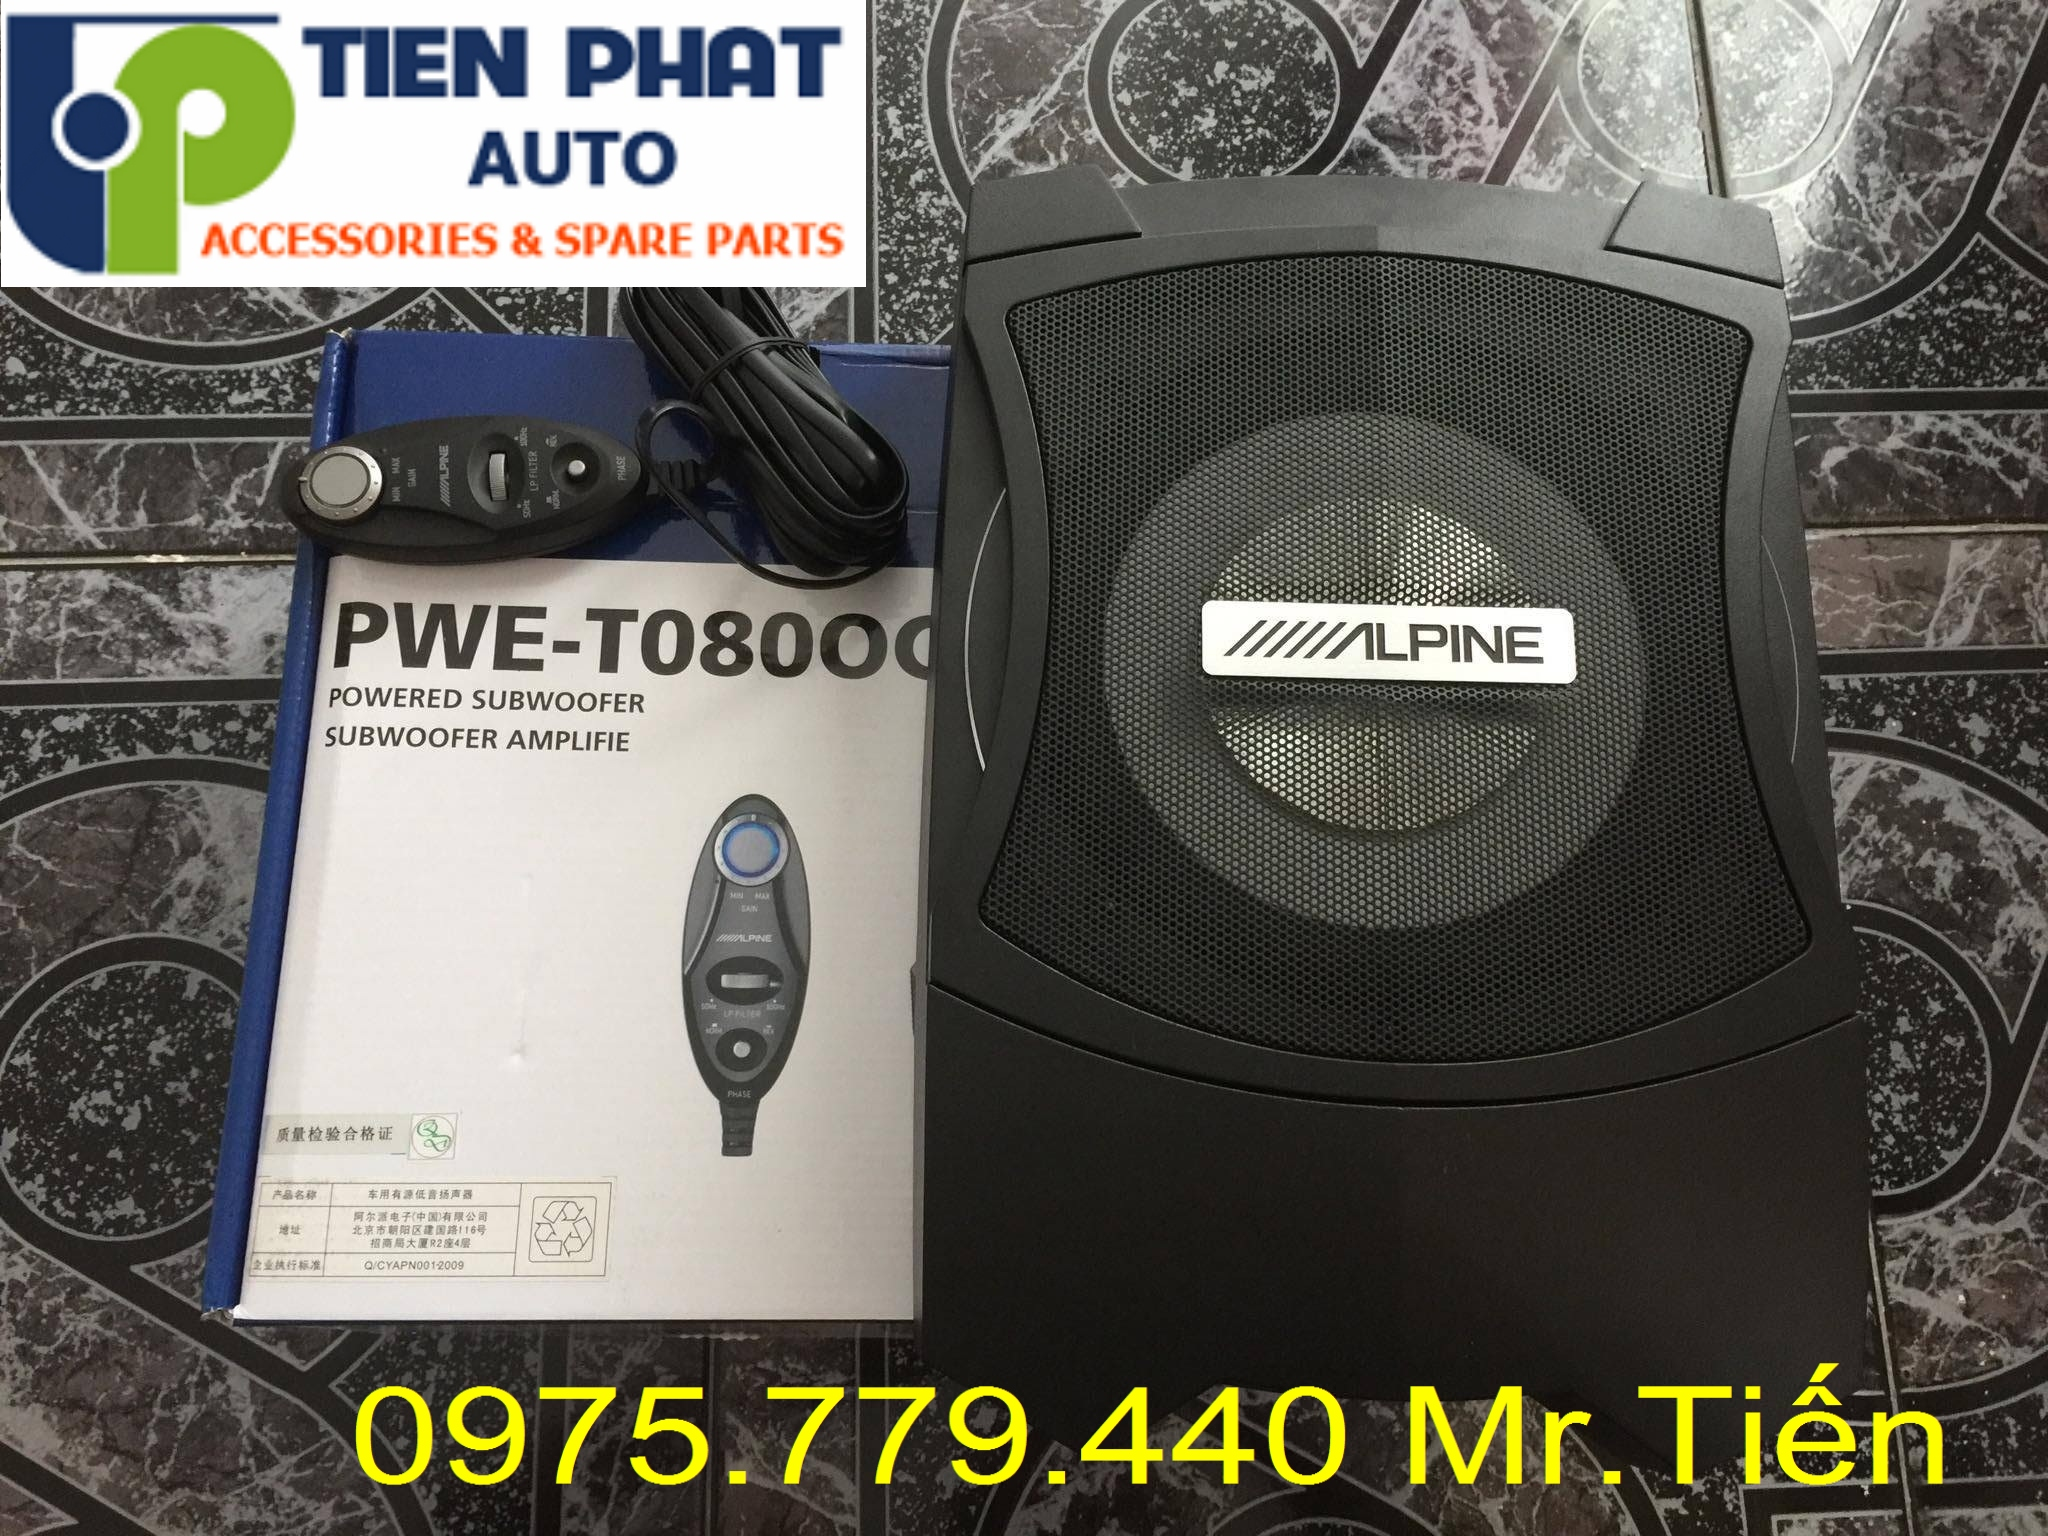 Lắp Loa sub Alpine PWE-T0800C cho Chevrolet Gentra Lắp Đặt Tận Nơi